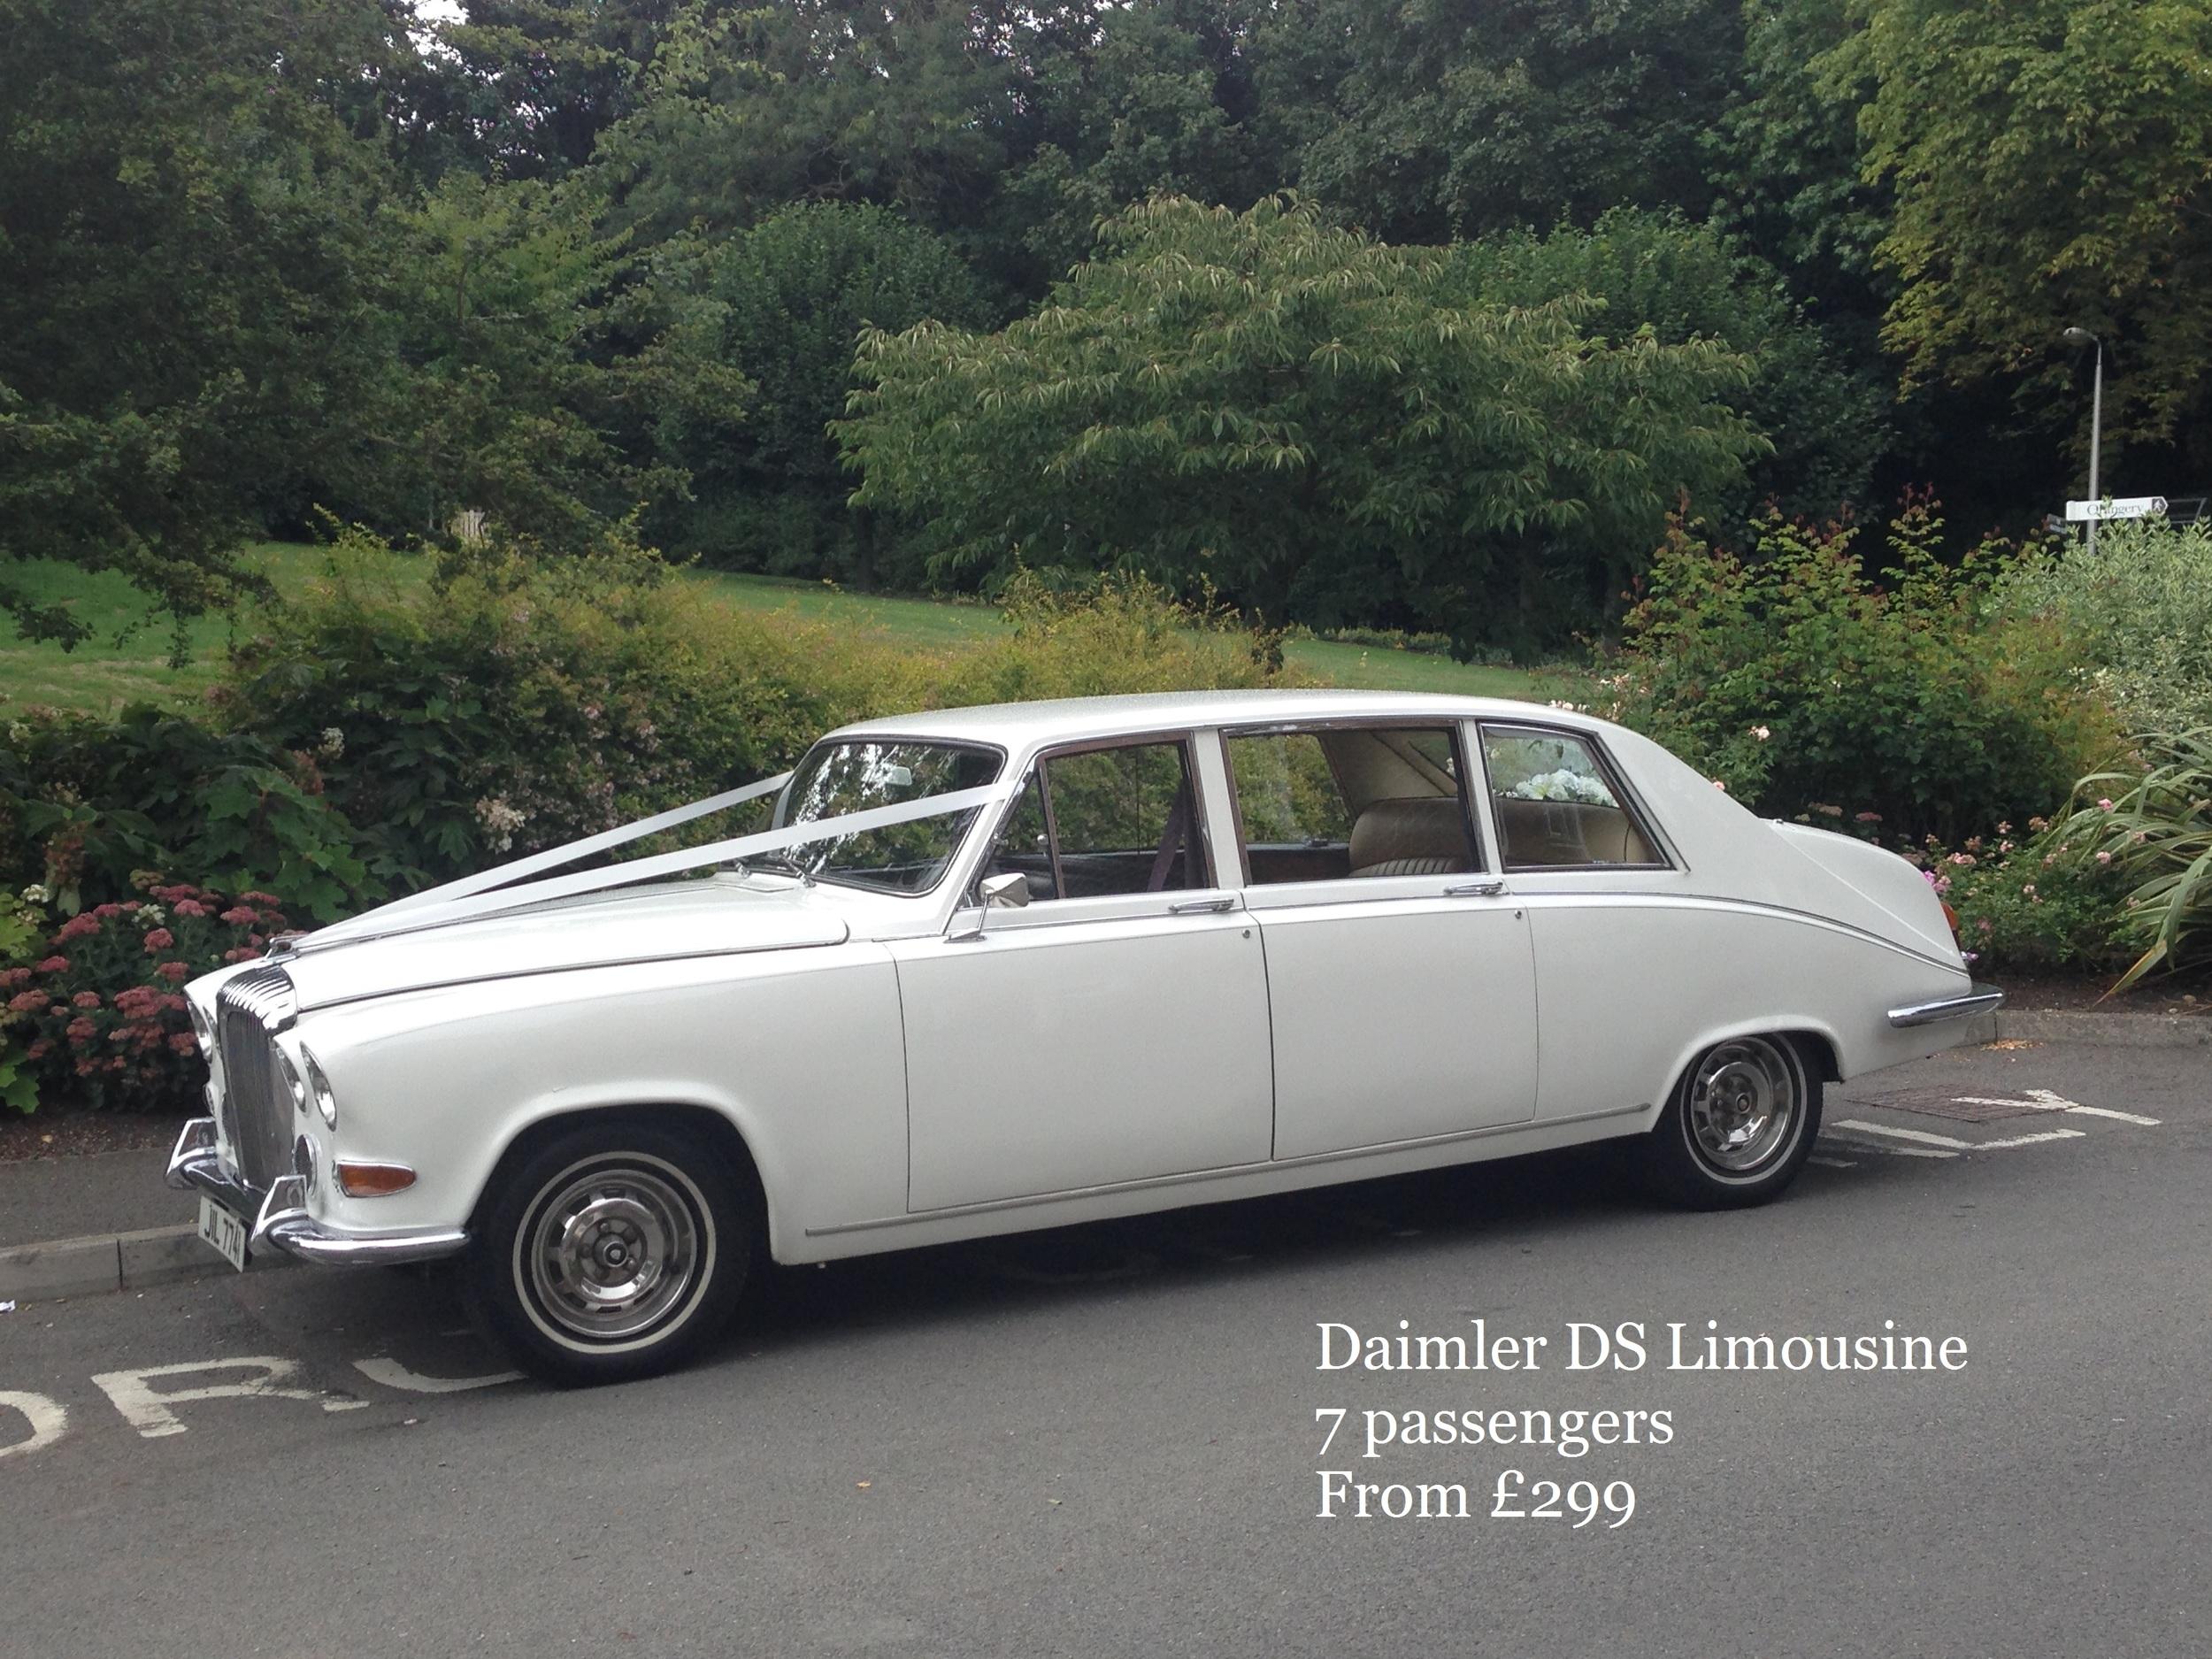 Daimler DS Limousine 7 passengers